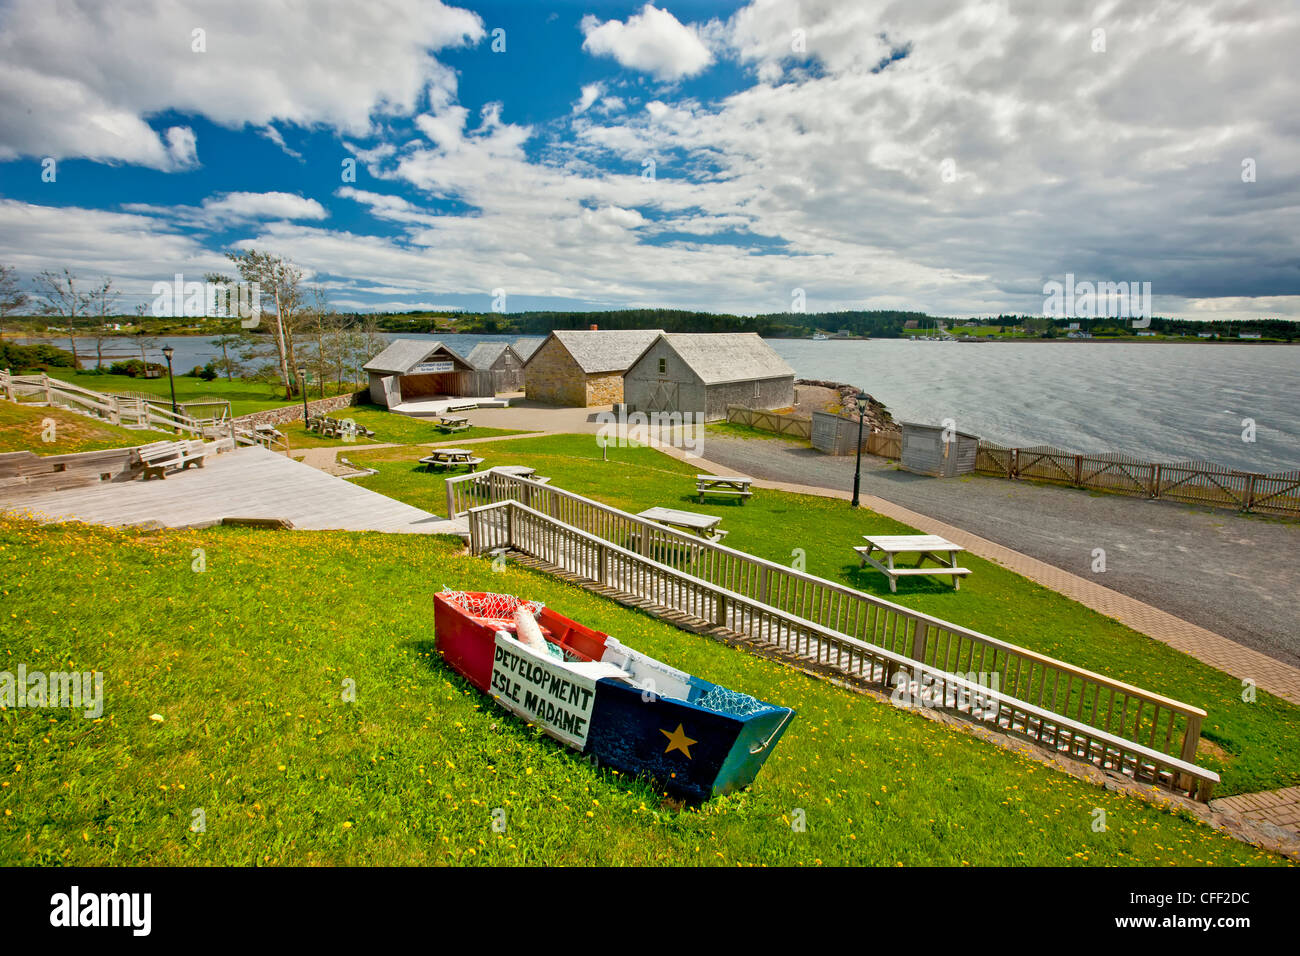 LeNoir Landing, Airchat Historic Waterfront, Isle Madame, Cape Breton, Nova Scotia, Canada - Stock Image